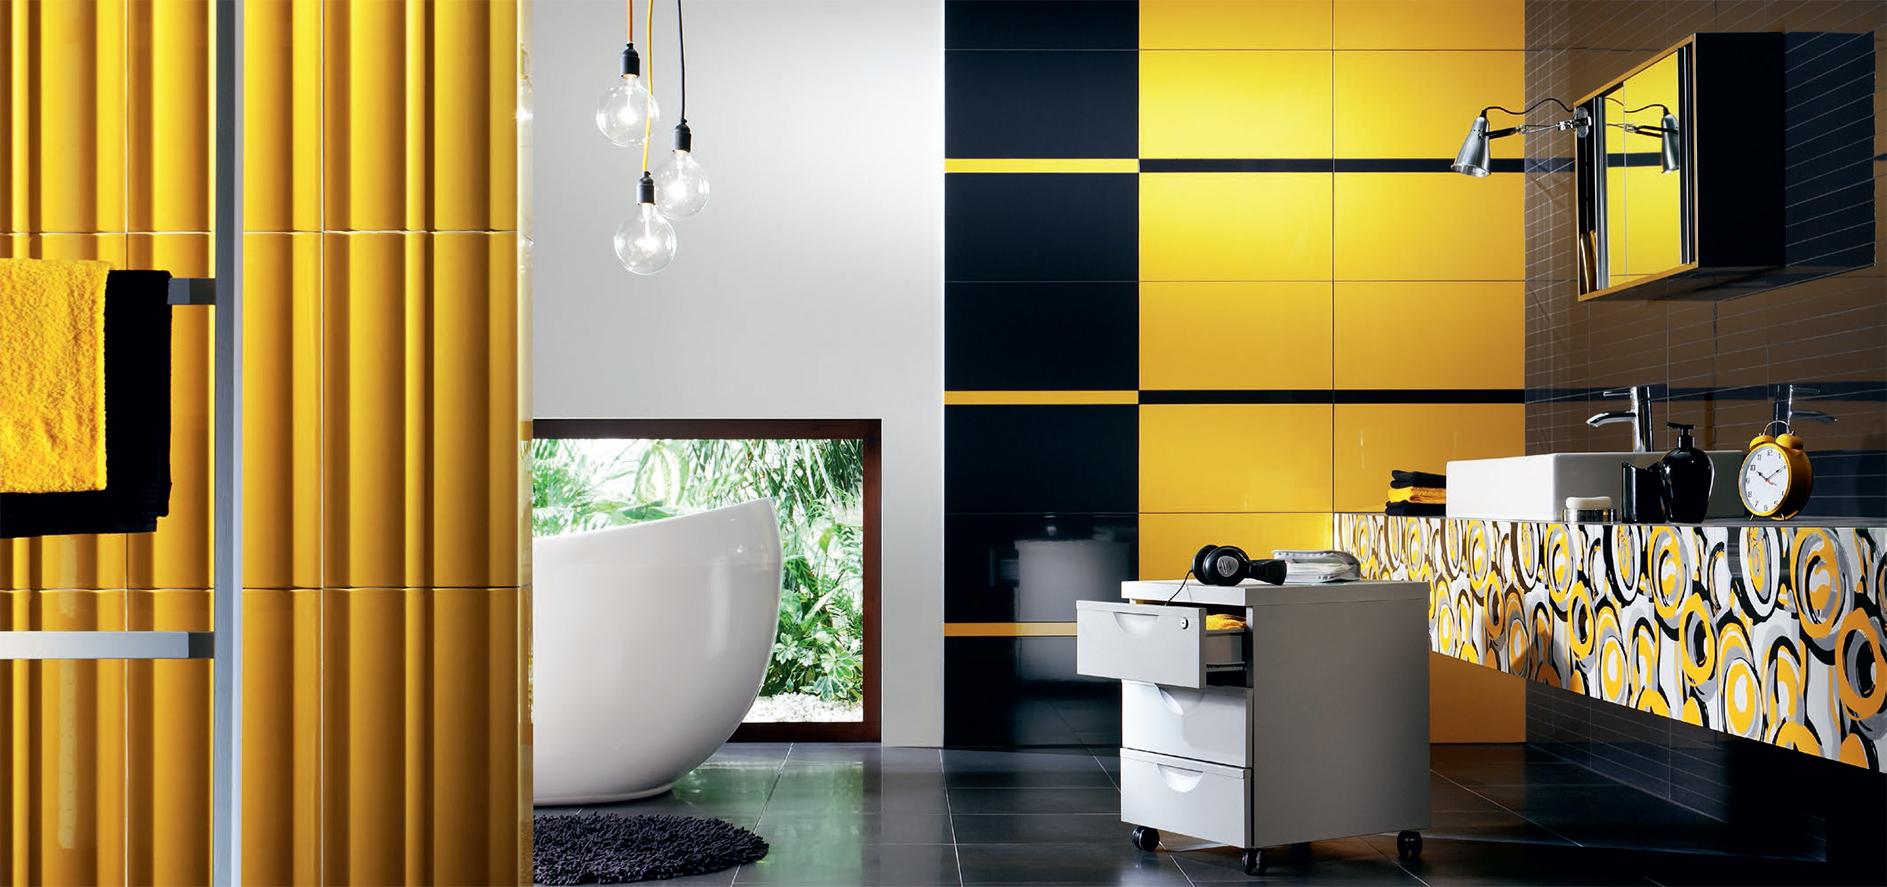 Piastrelle Arancioni Per Bagno piastrelle gialle per il bagno (17 foto): piastrelle per il